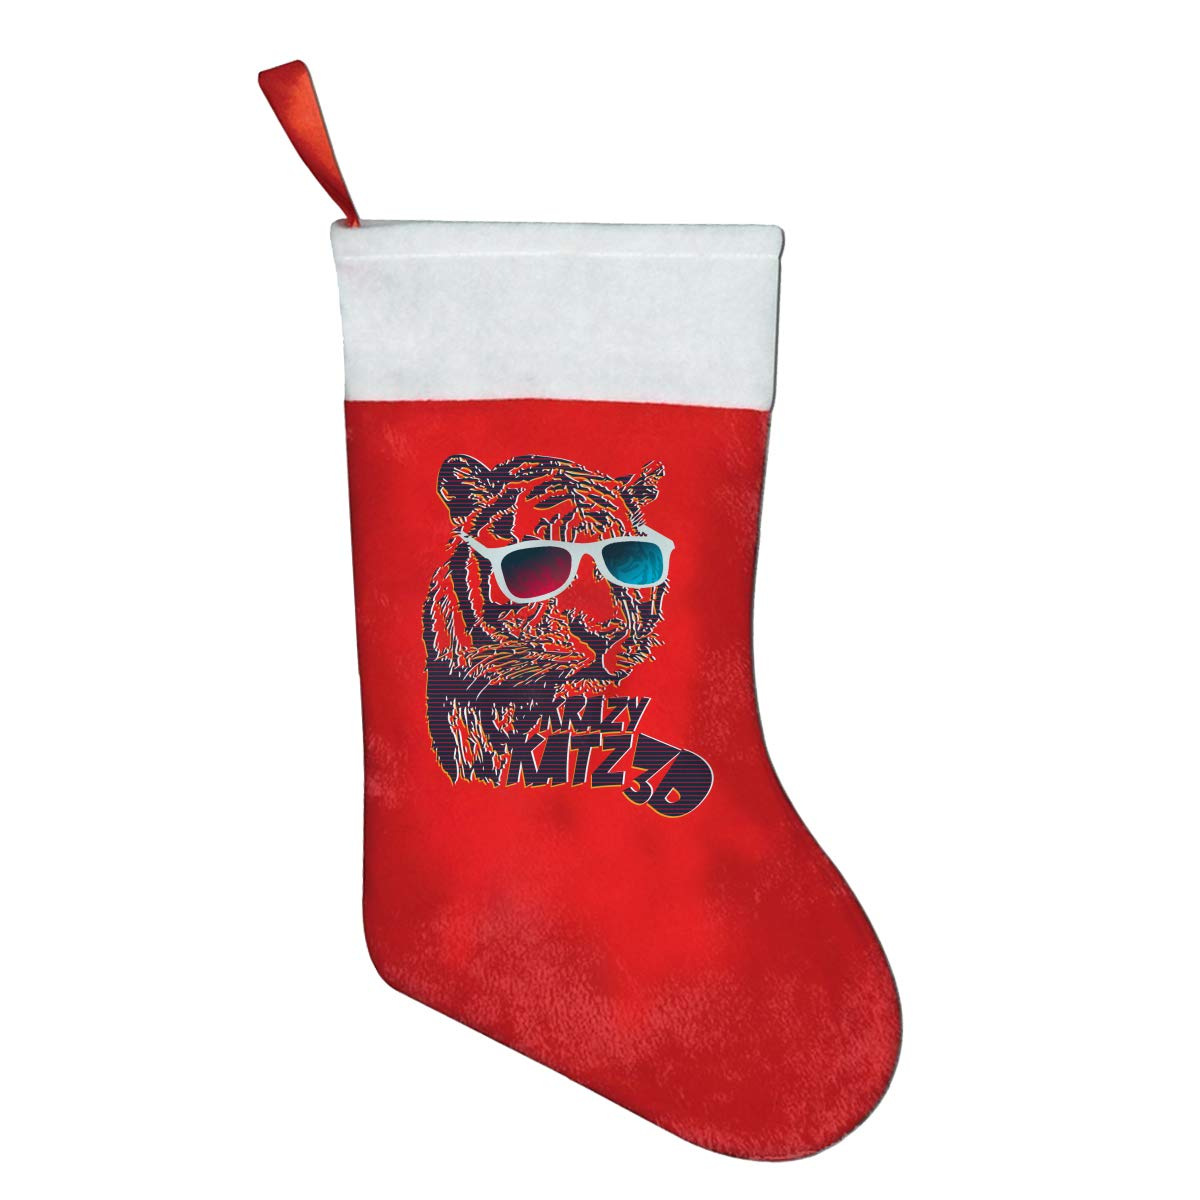 Christmas Xmas Red Stocking Present Gift Bag Santa Claus 42cm